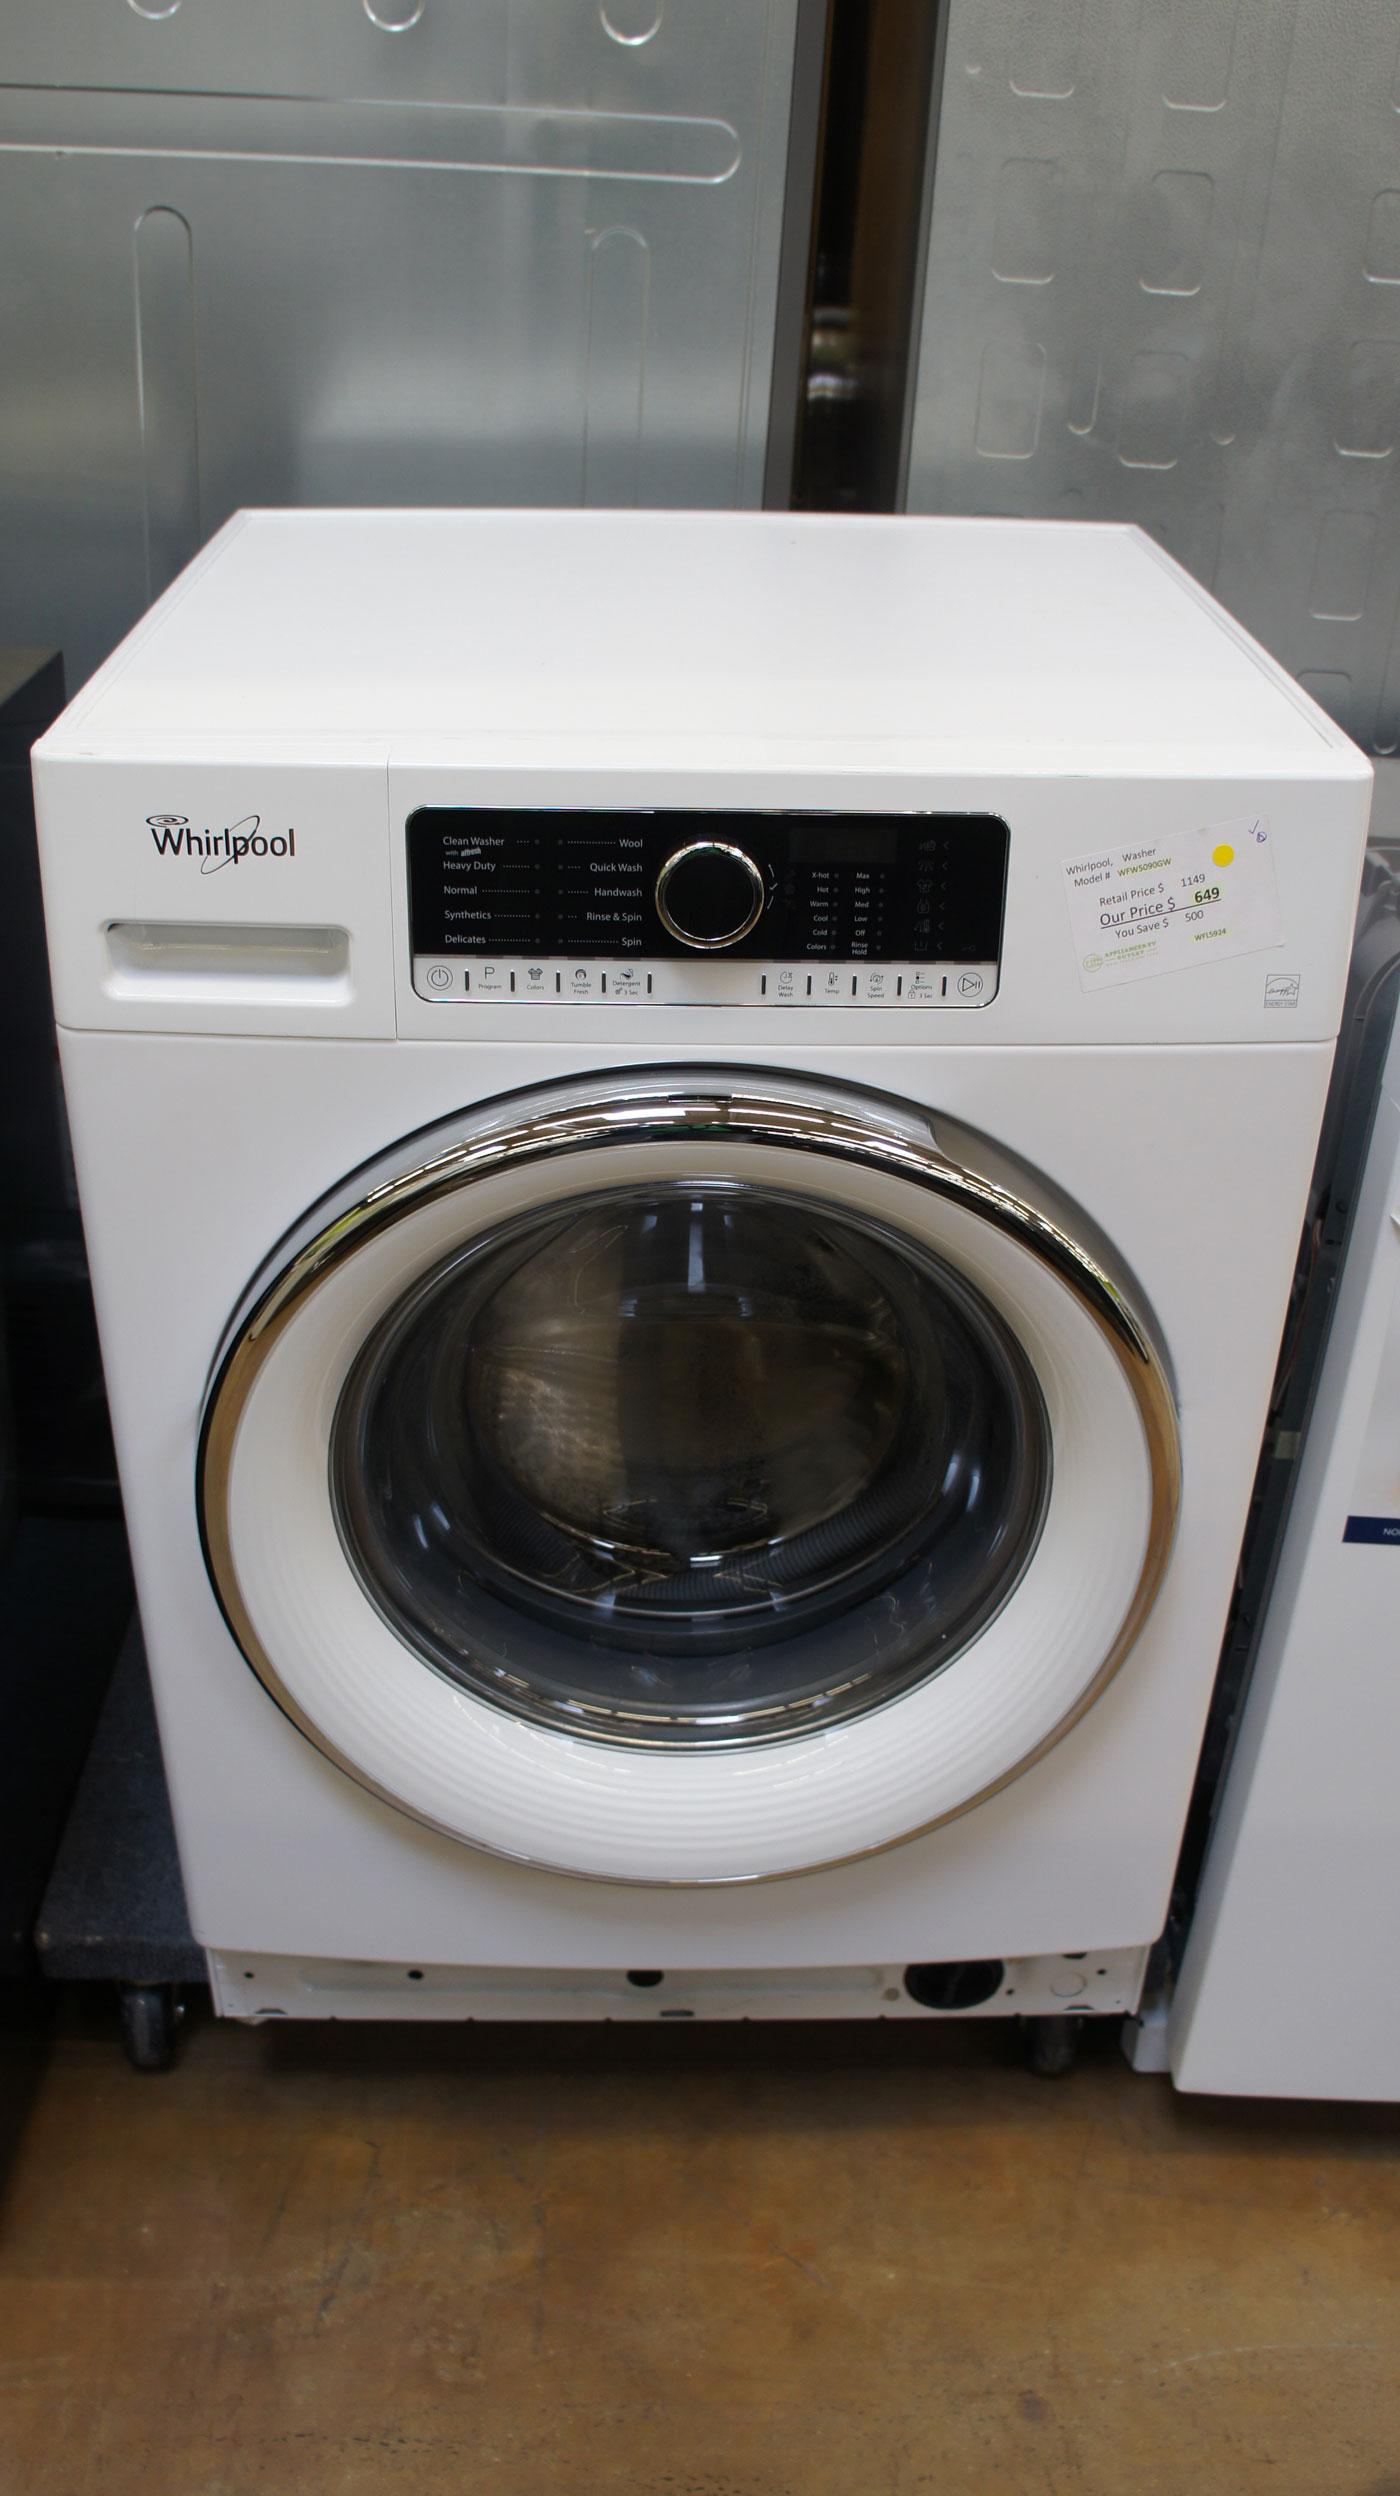 "24"" Whirlpool WFW5090G Washer"